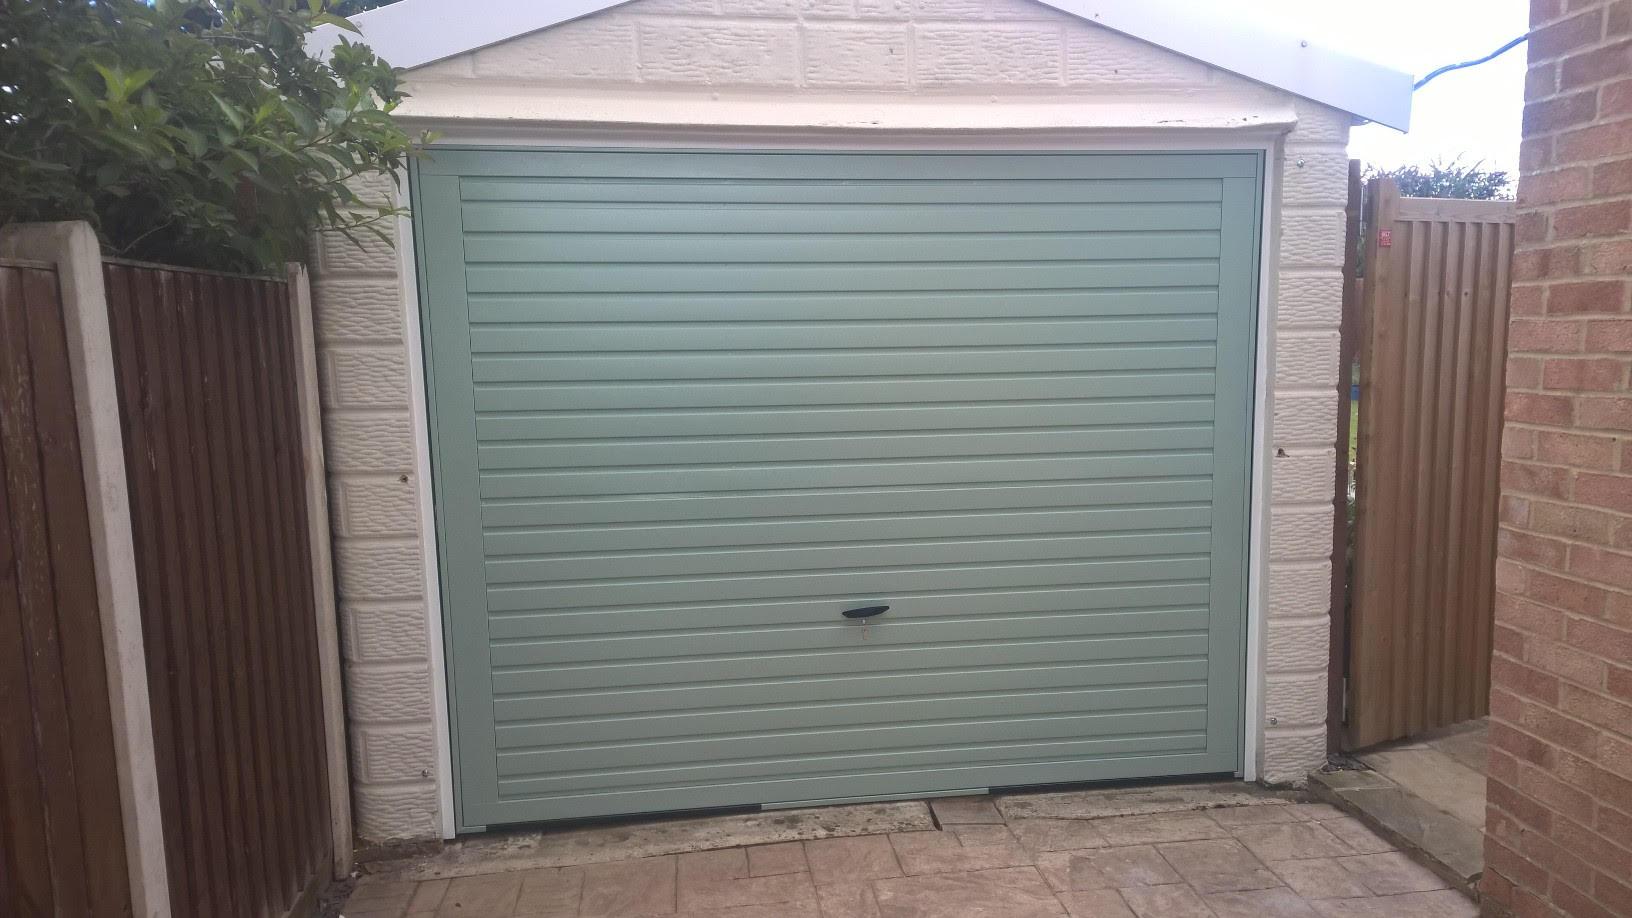 Chartwell Green Up And Over Garage Door Elite Gd